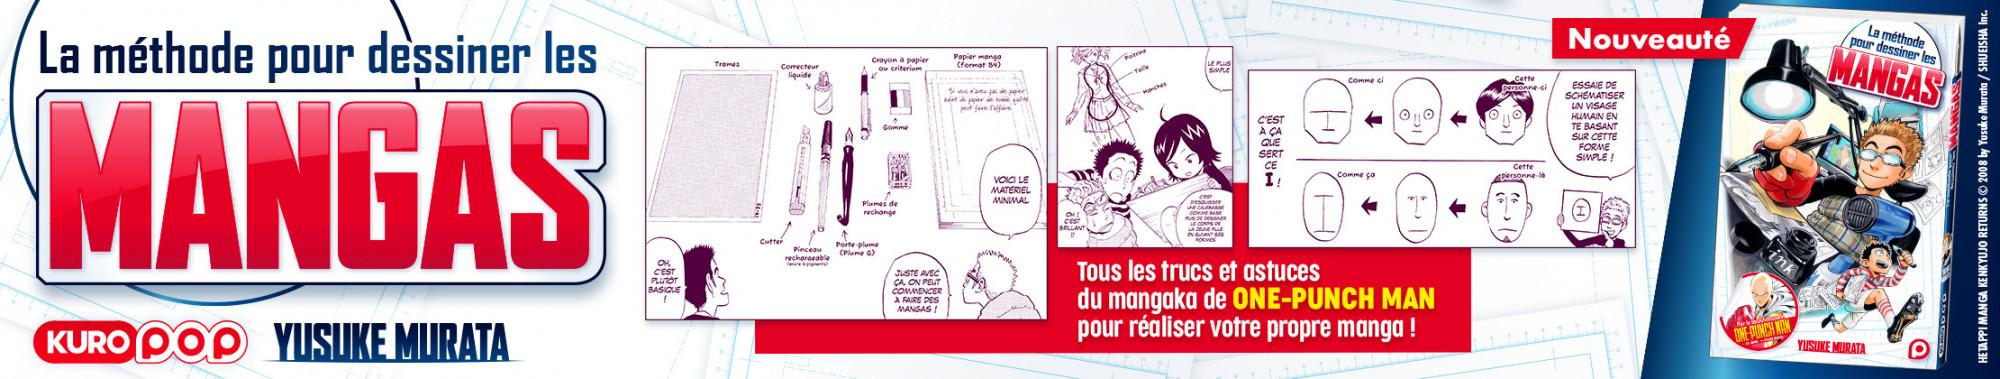 Slider - KUROKAWA - La méthode pour dessiner les mangas